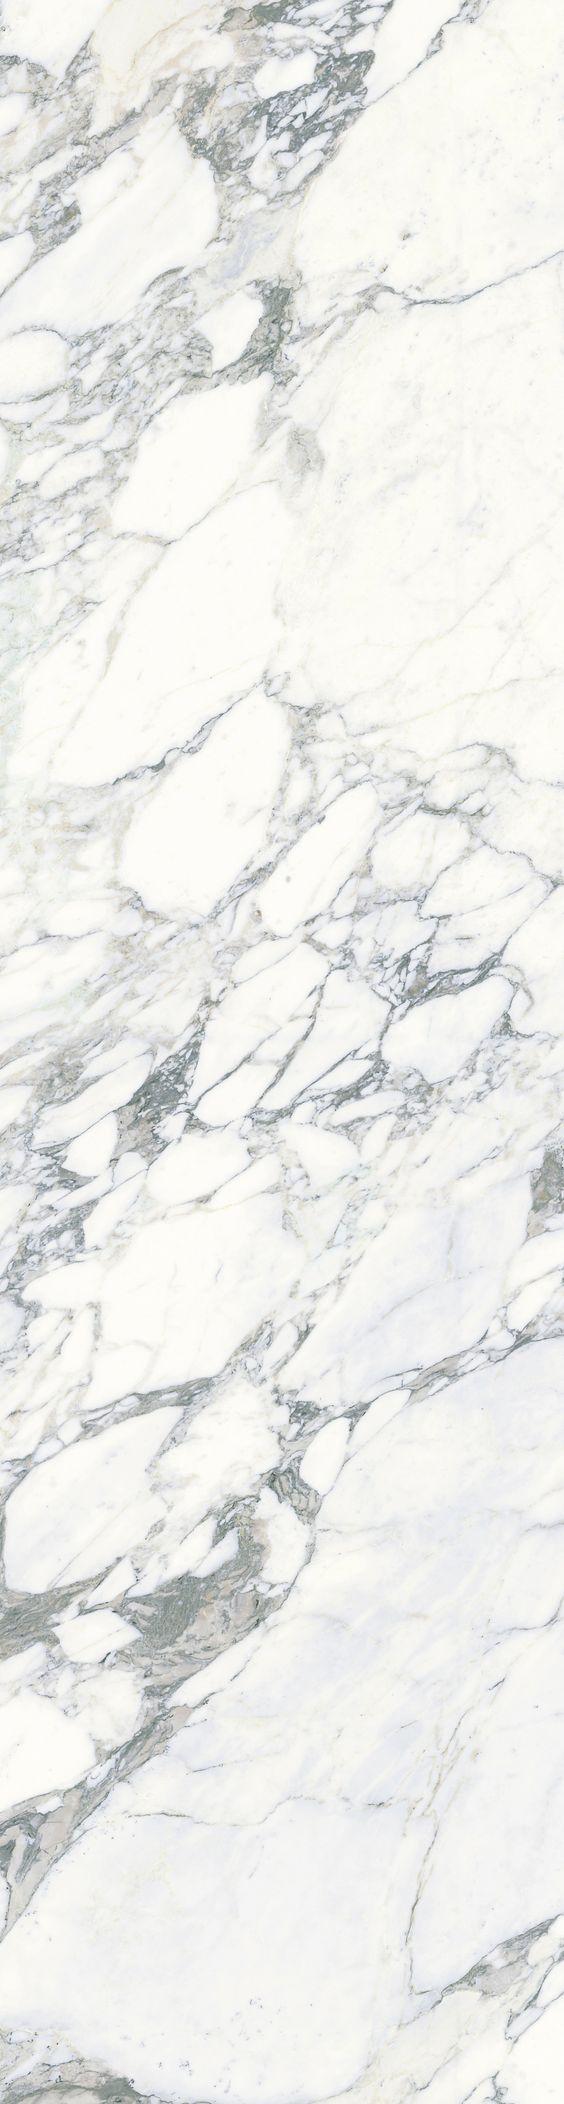 marmor insp 3.jpg